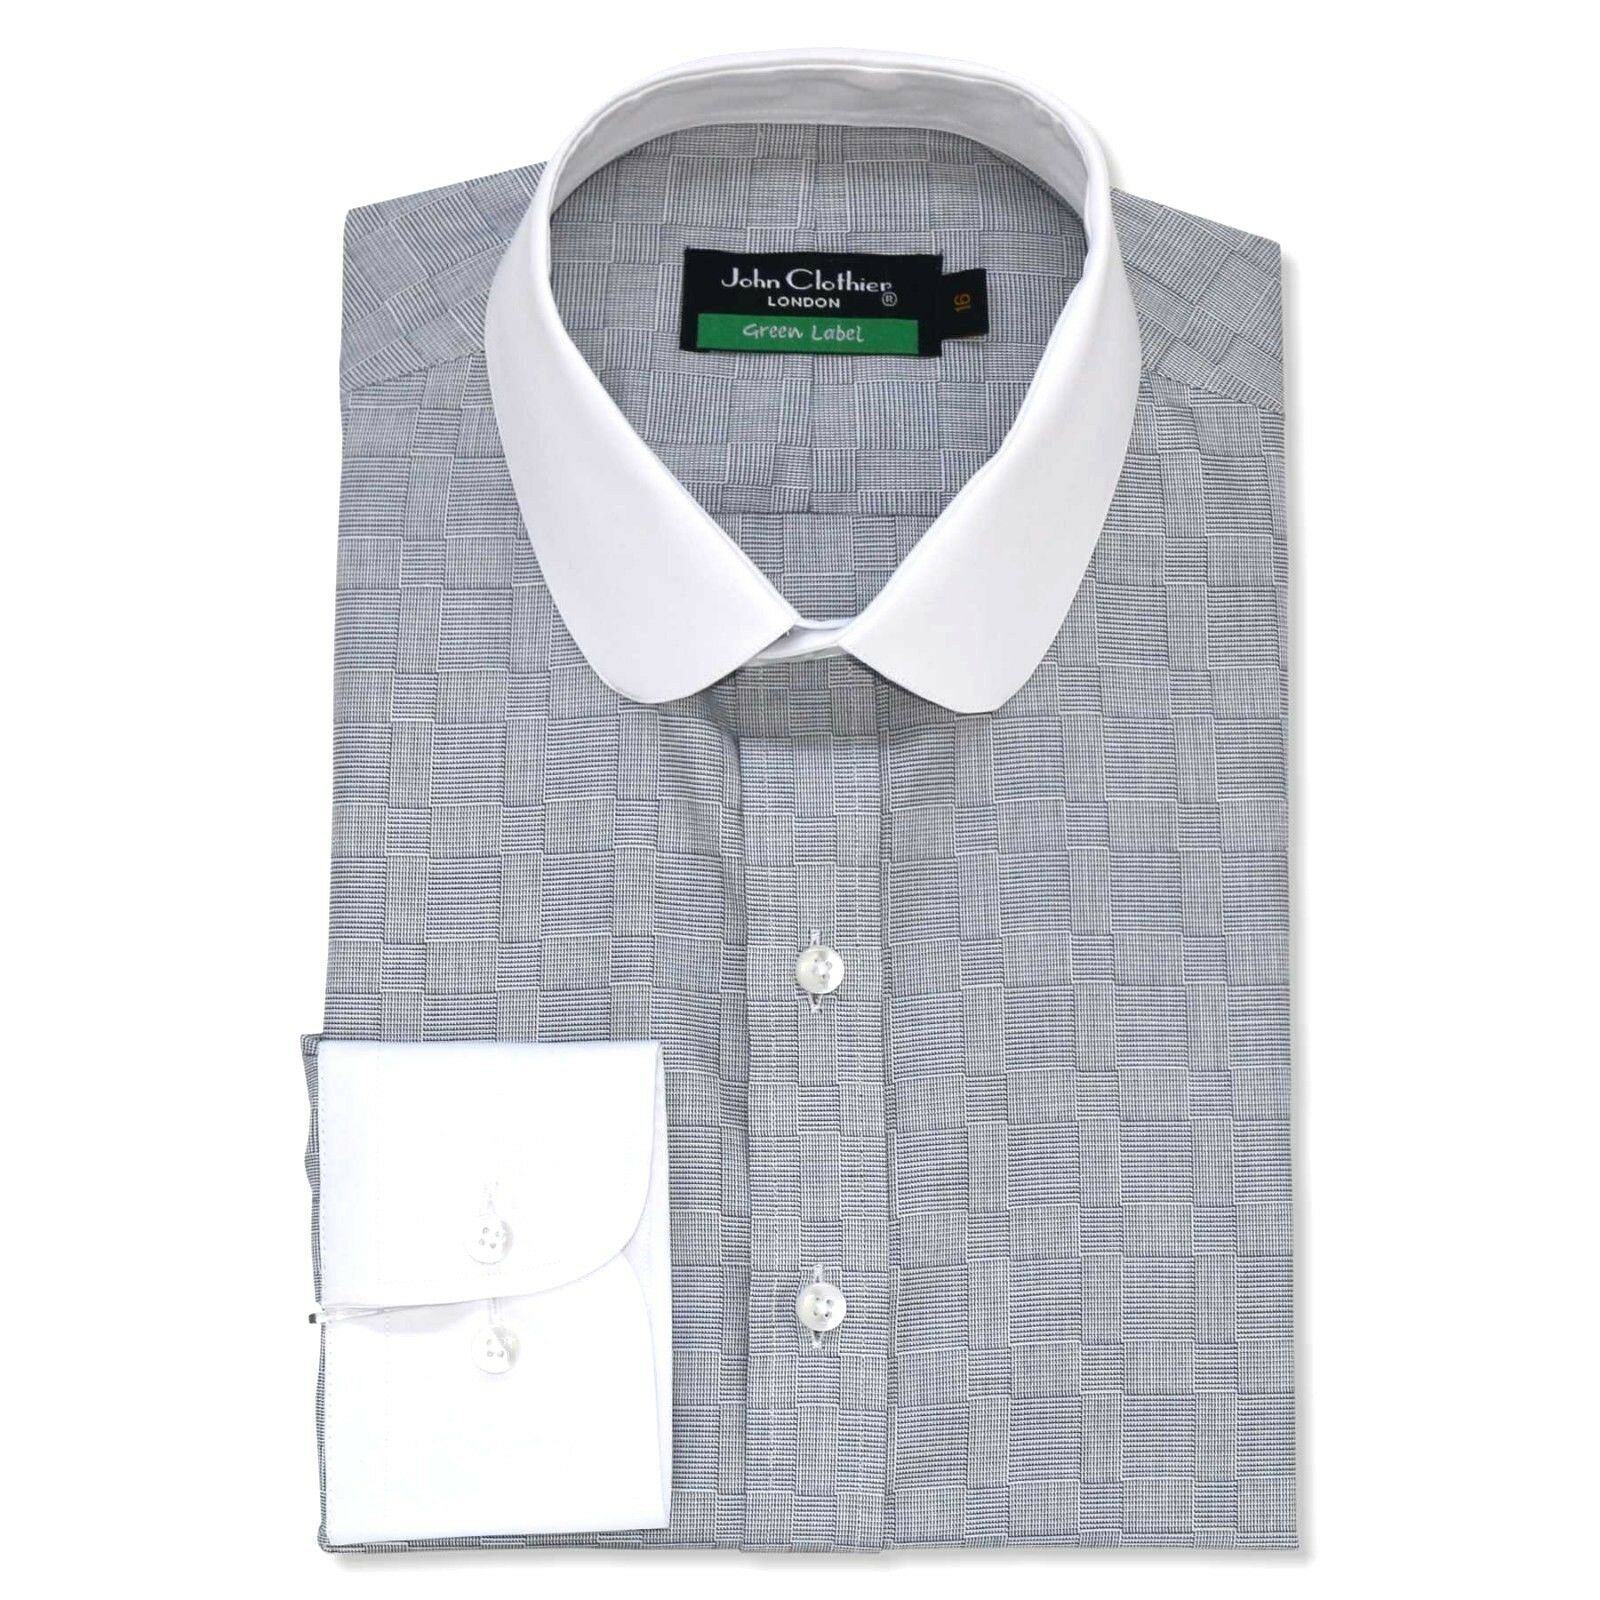 Peaky Blinders  Herren shirts Penny collar Olive Grün Grau tile Grandad Round Club